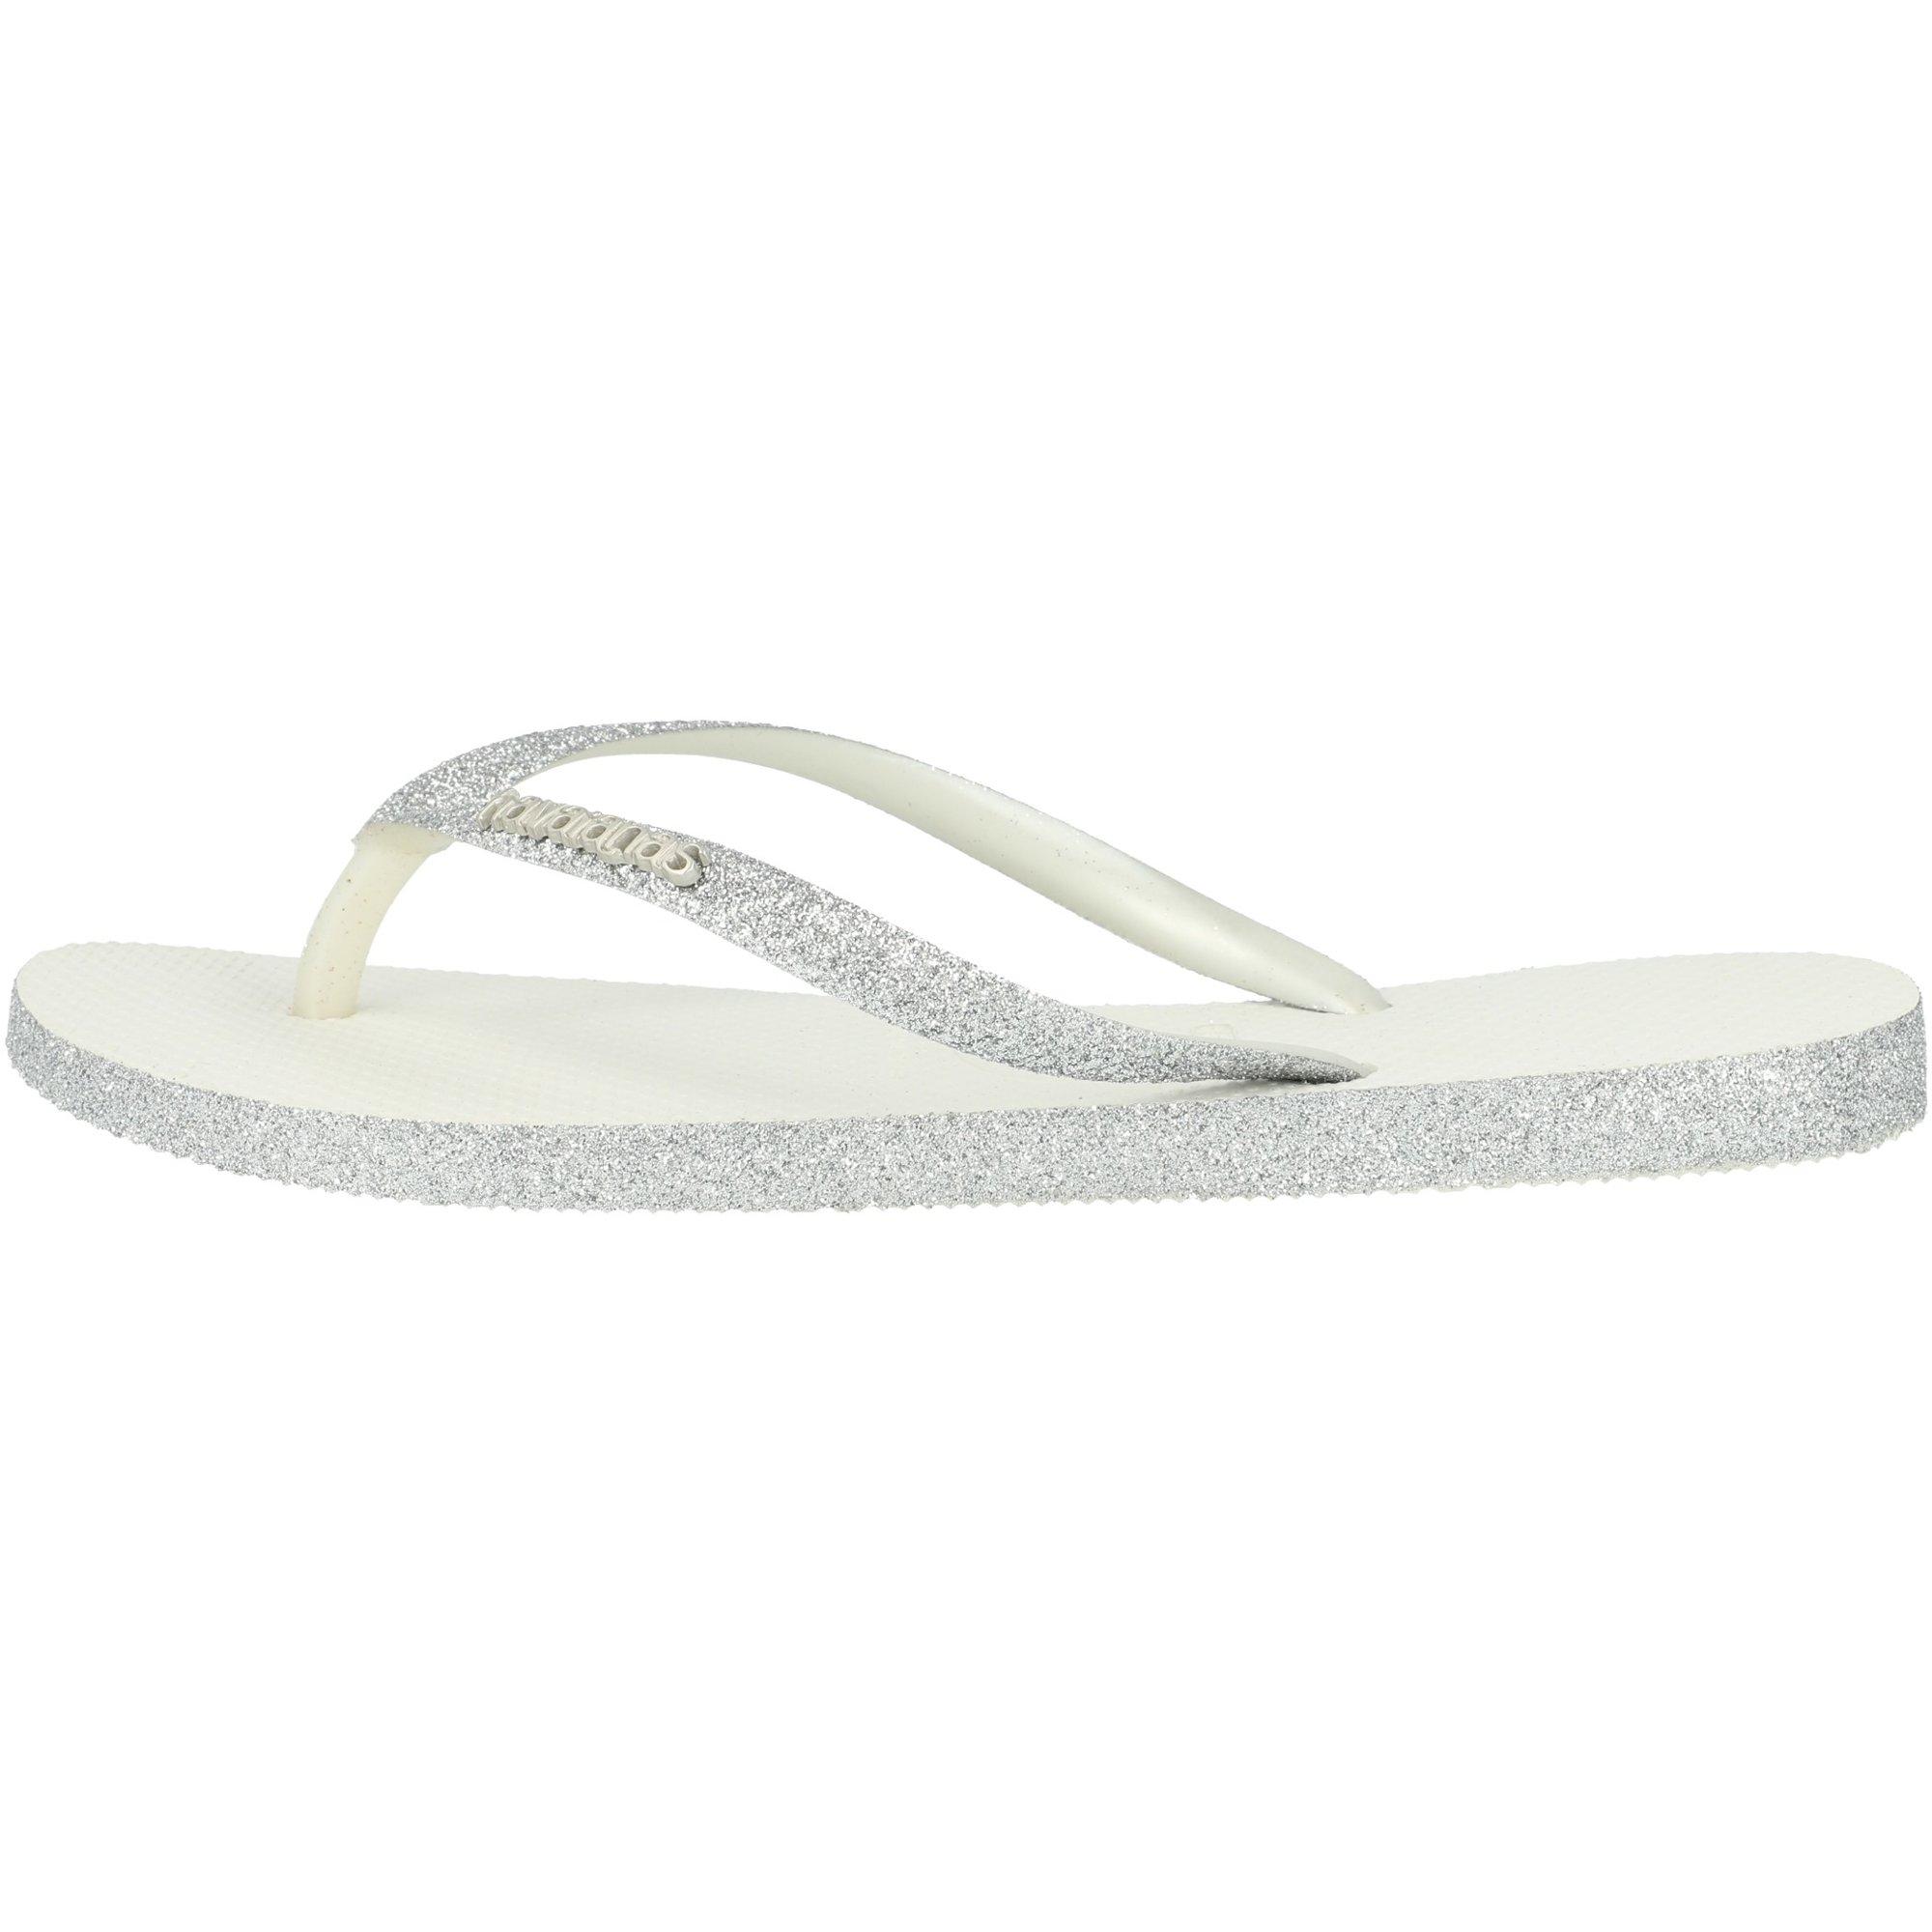 Havaianas Slim Sparkle White Rubber